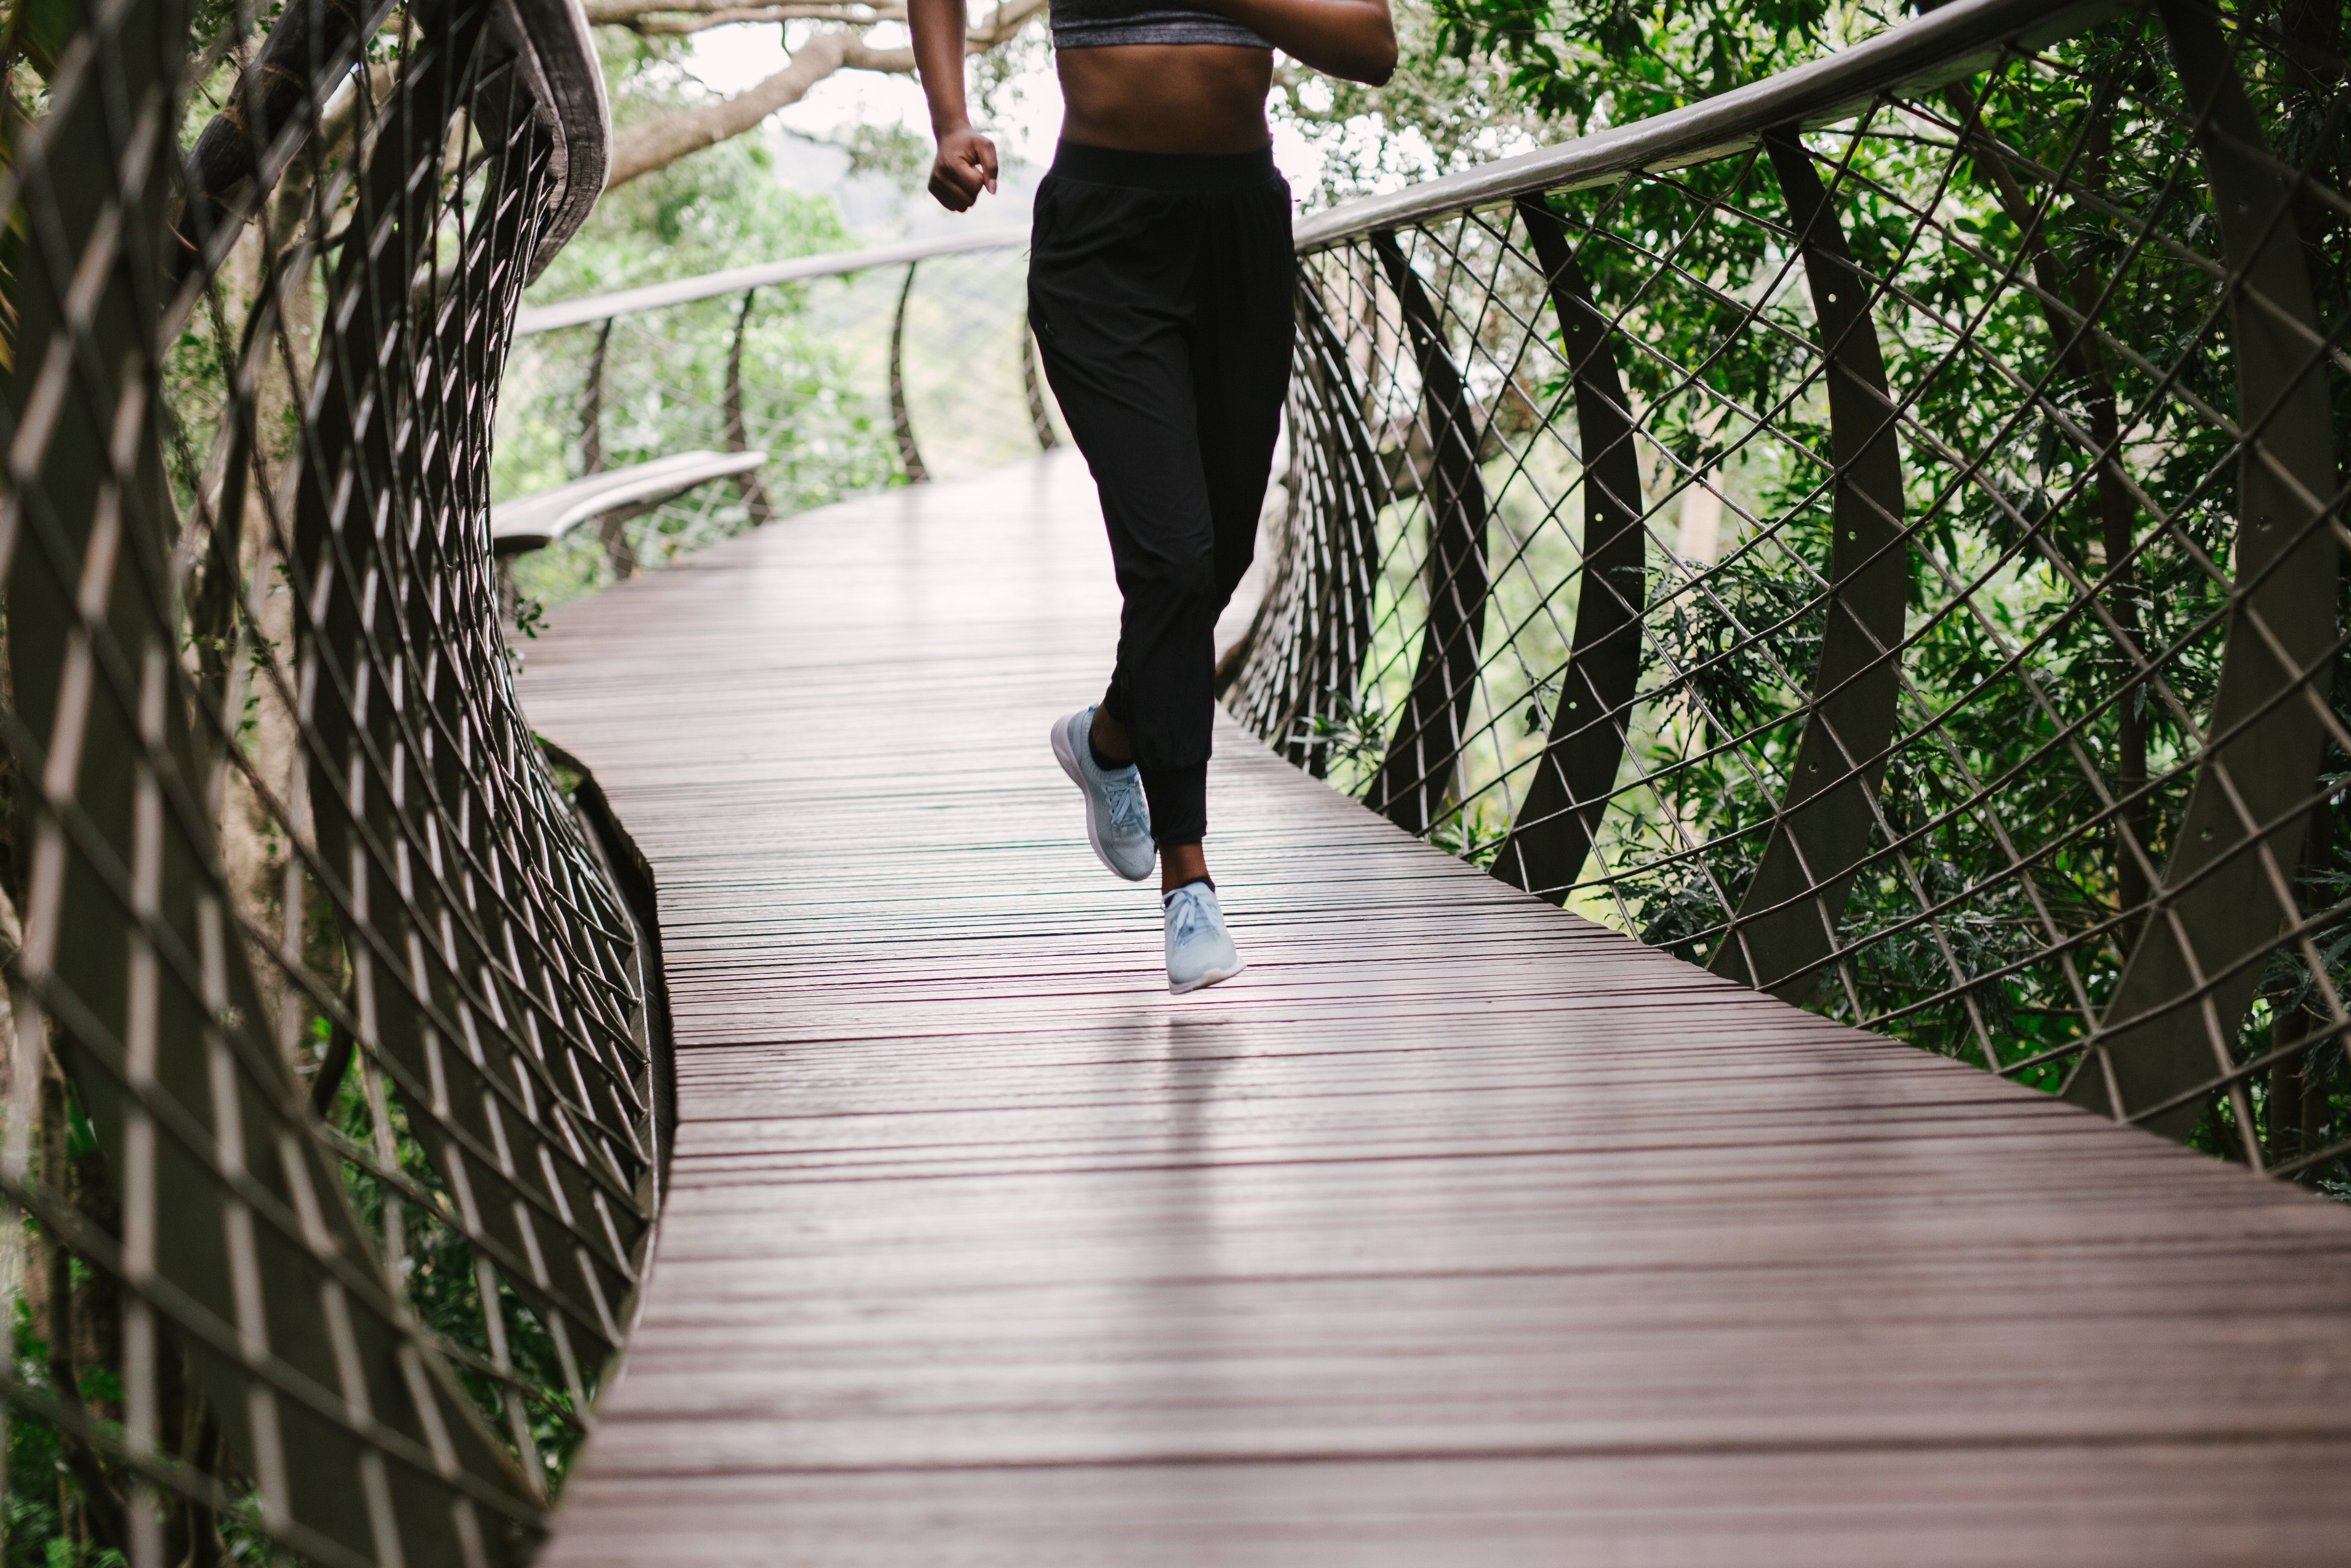 photo-of-person-running-on-bridge-3059982.jpg